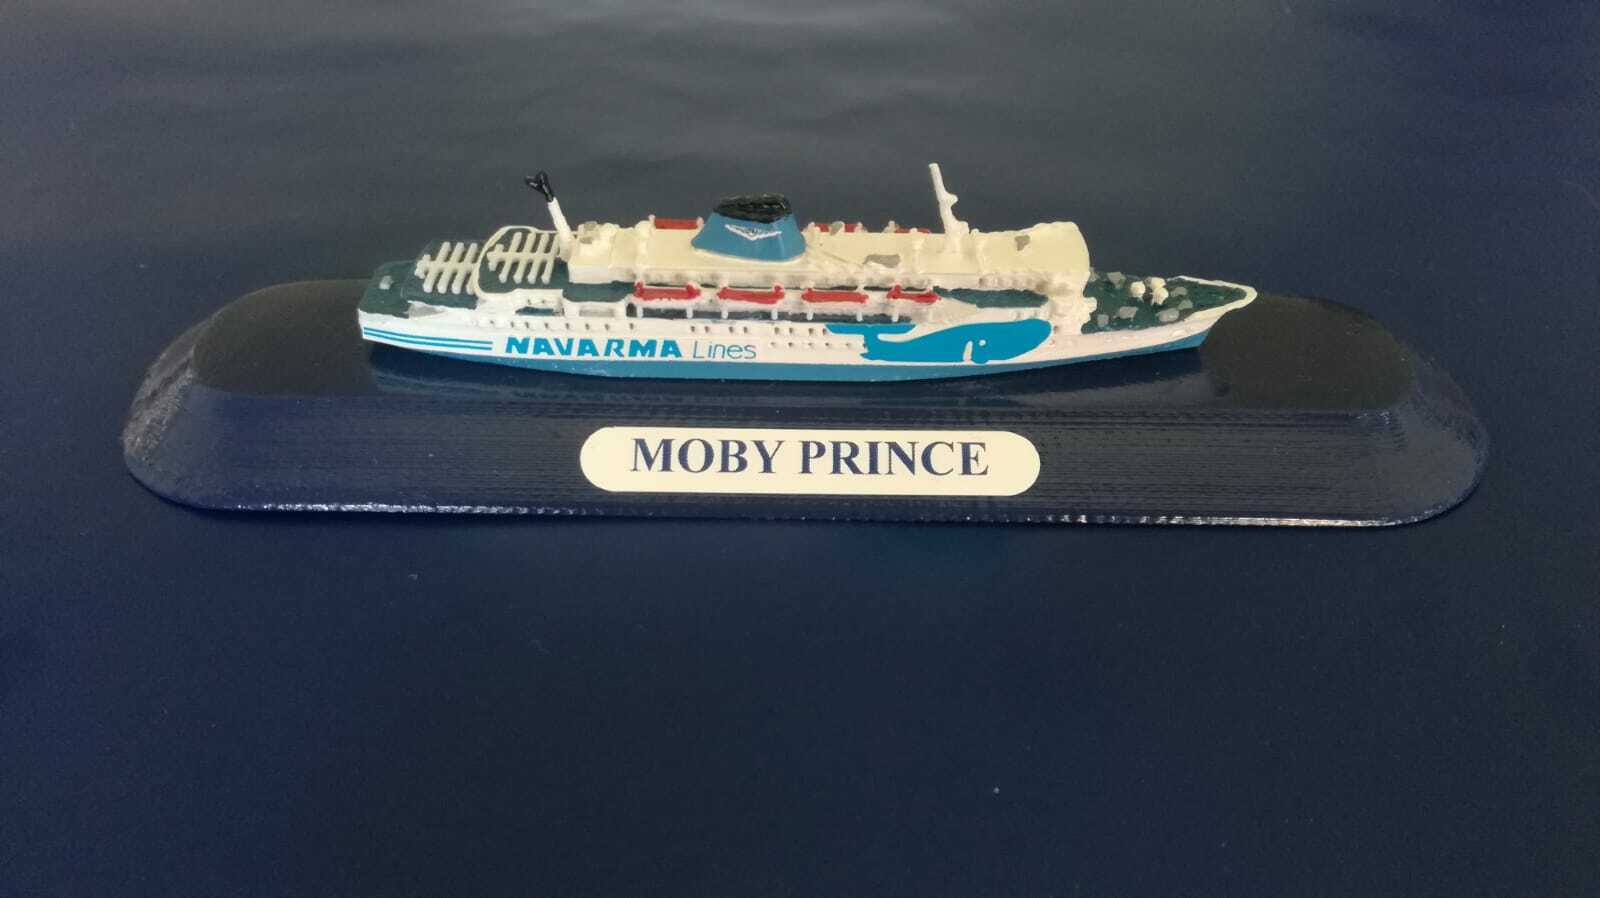 MOBY PRINCE ex Koningin Juliana modellino nave scala 1 1250 MOBY- Navarma Lines